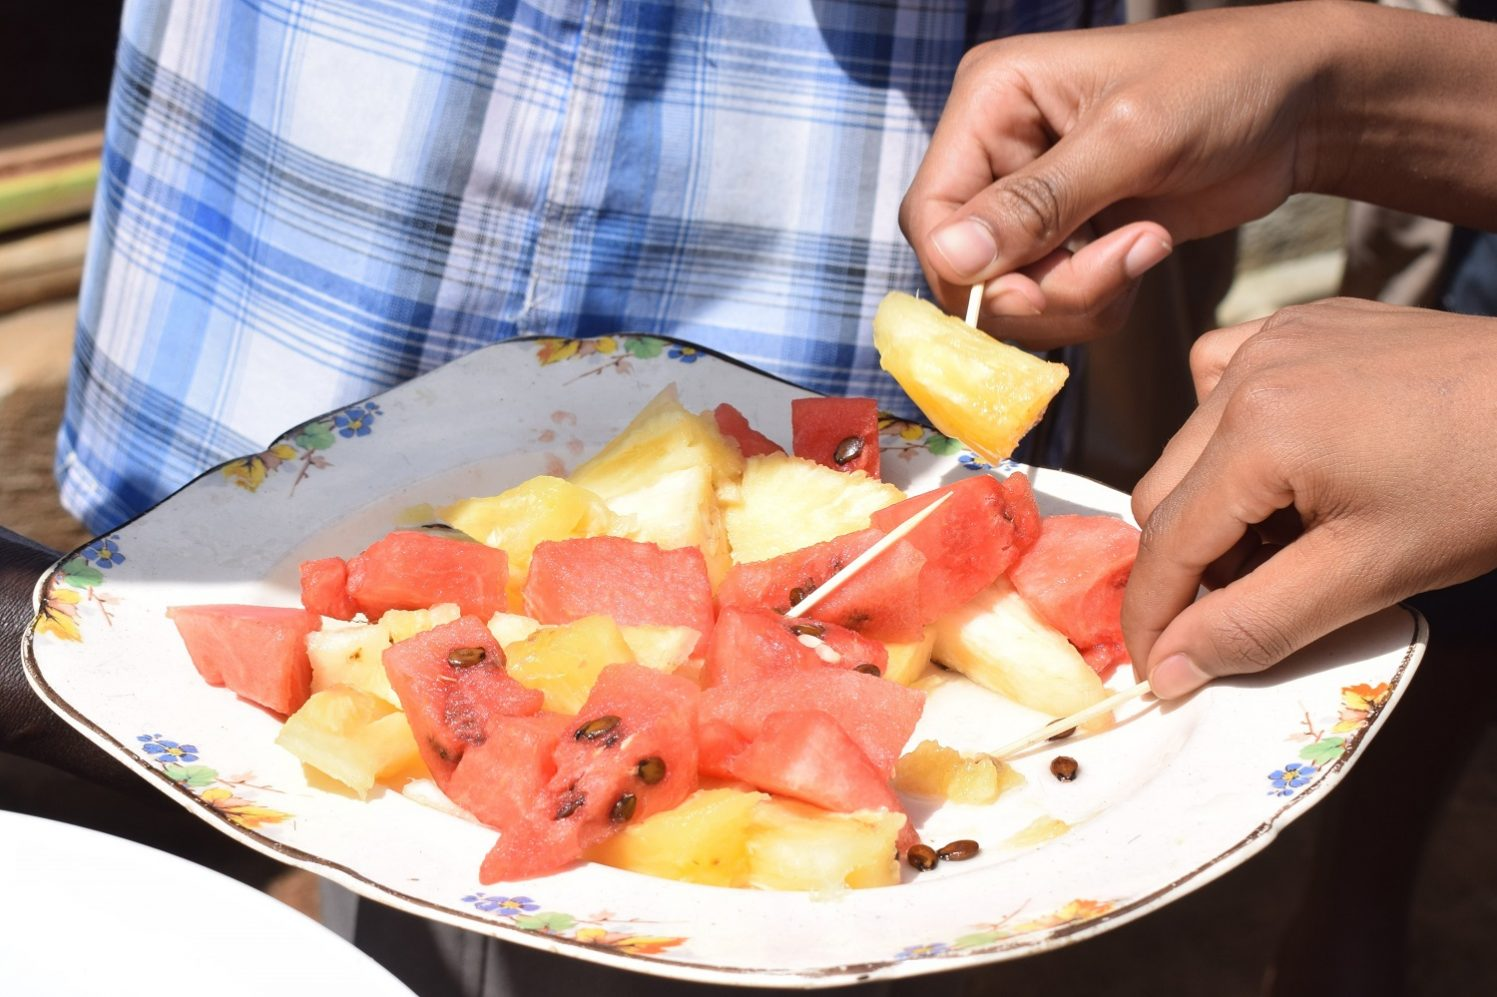 Pineapple & Melon